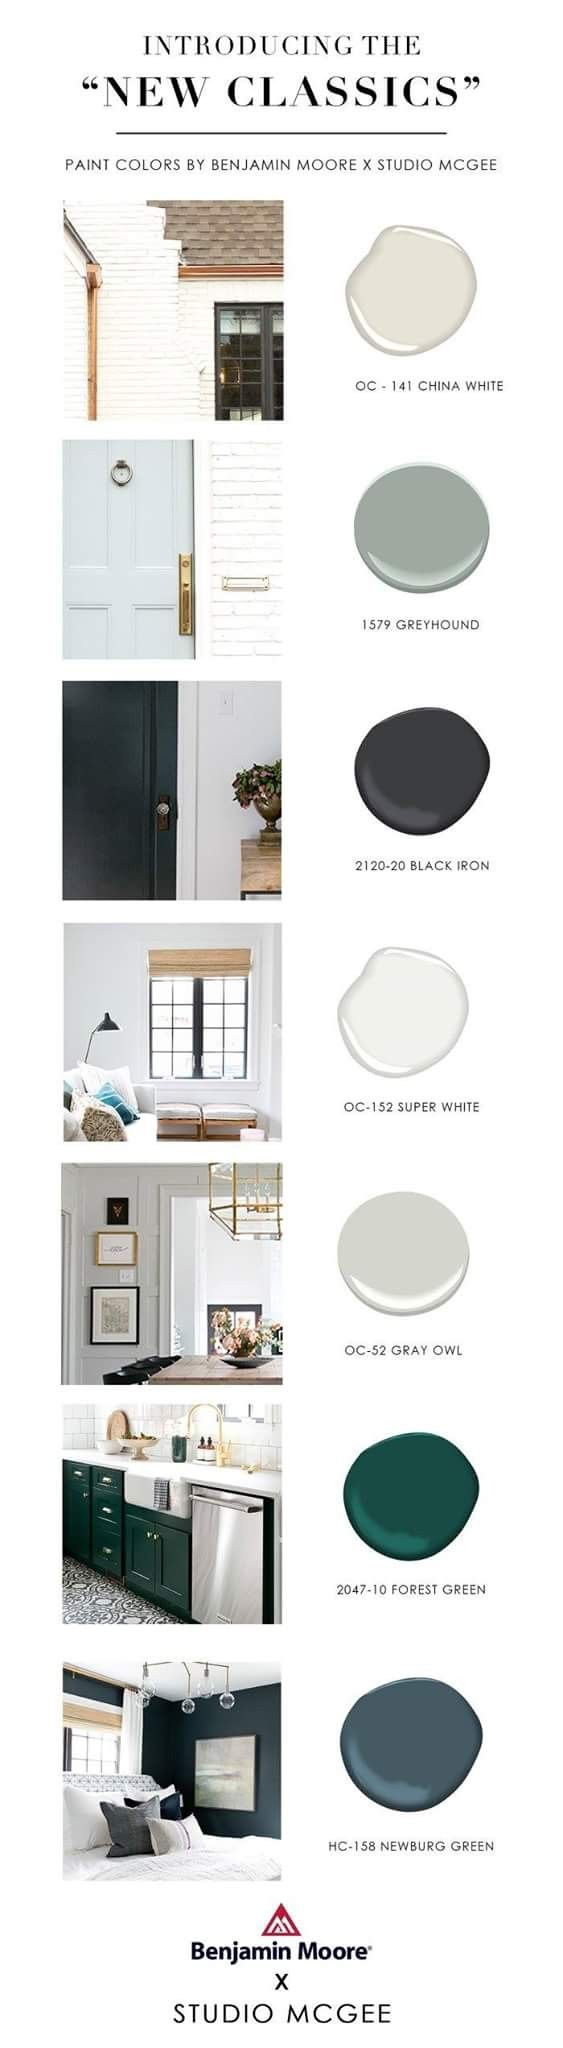 Super white and window